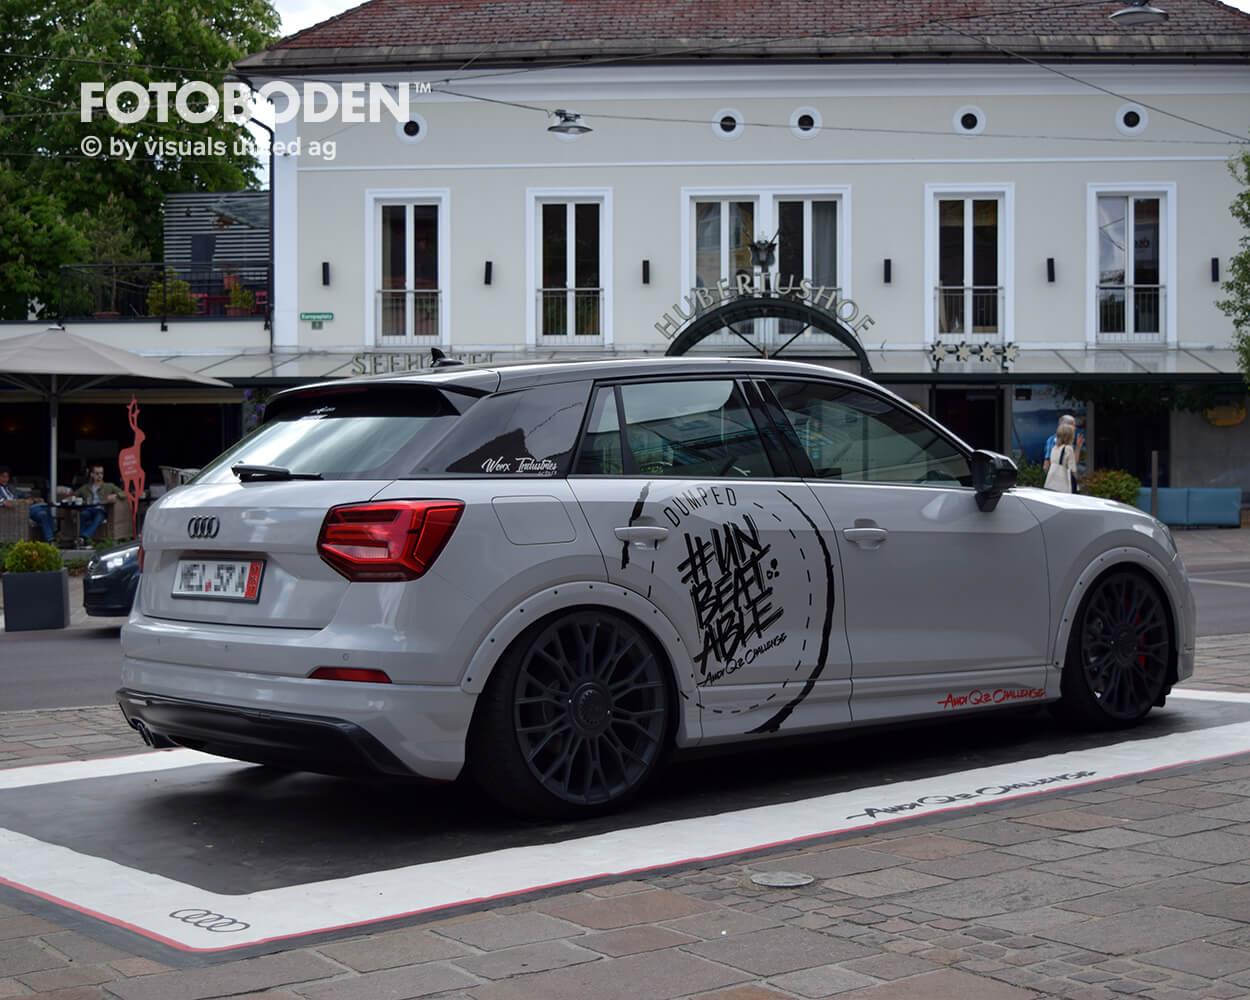 Audi Fotoboden Flooring Fußboden Bodengestaltung Floorminder Bodendruck Werbung Fußbodenwerbung Bodenwerbung Merchandising Advertising Visualmerchandising5